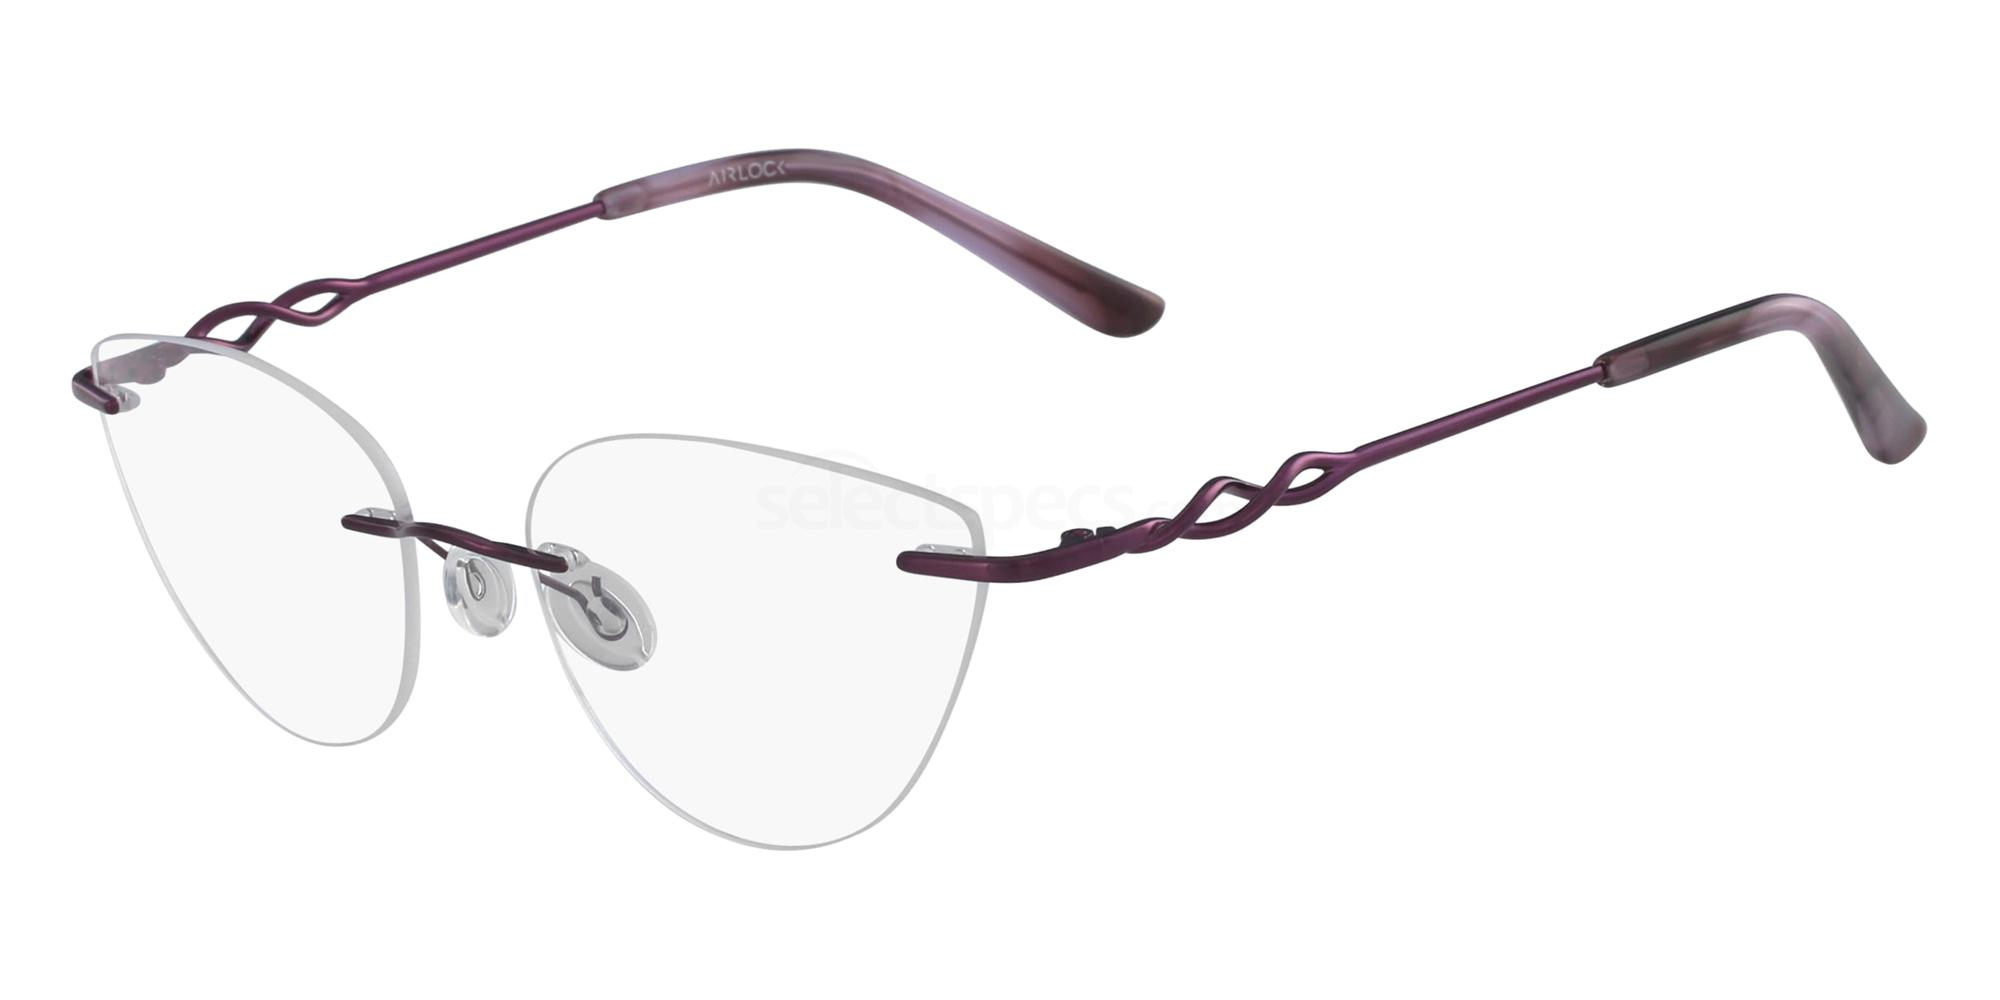 505 ESSENCE 201 Glasses, AIRLOCK